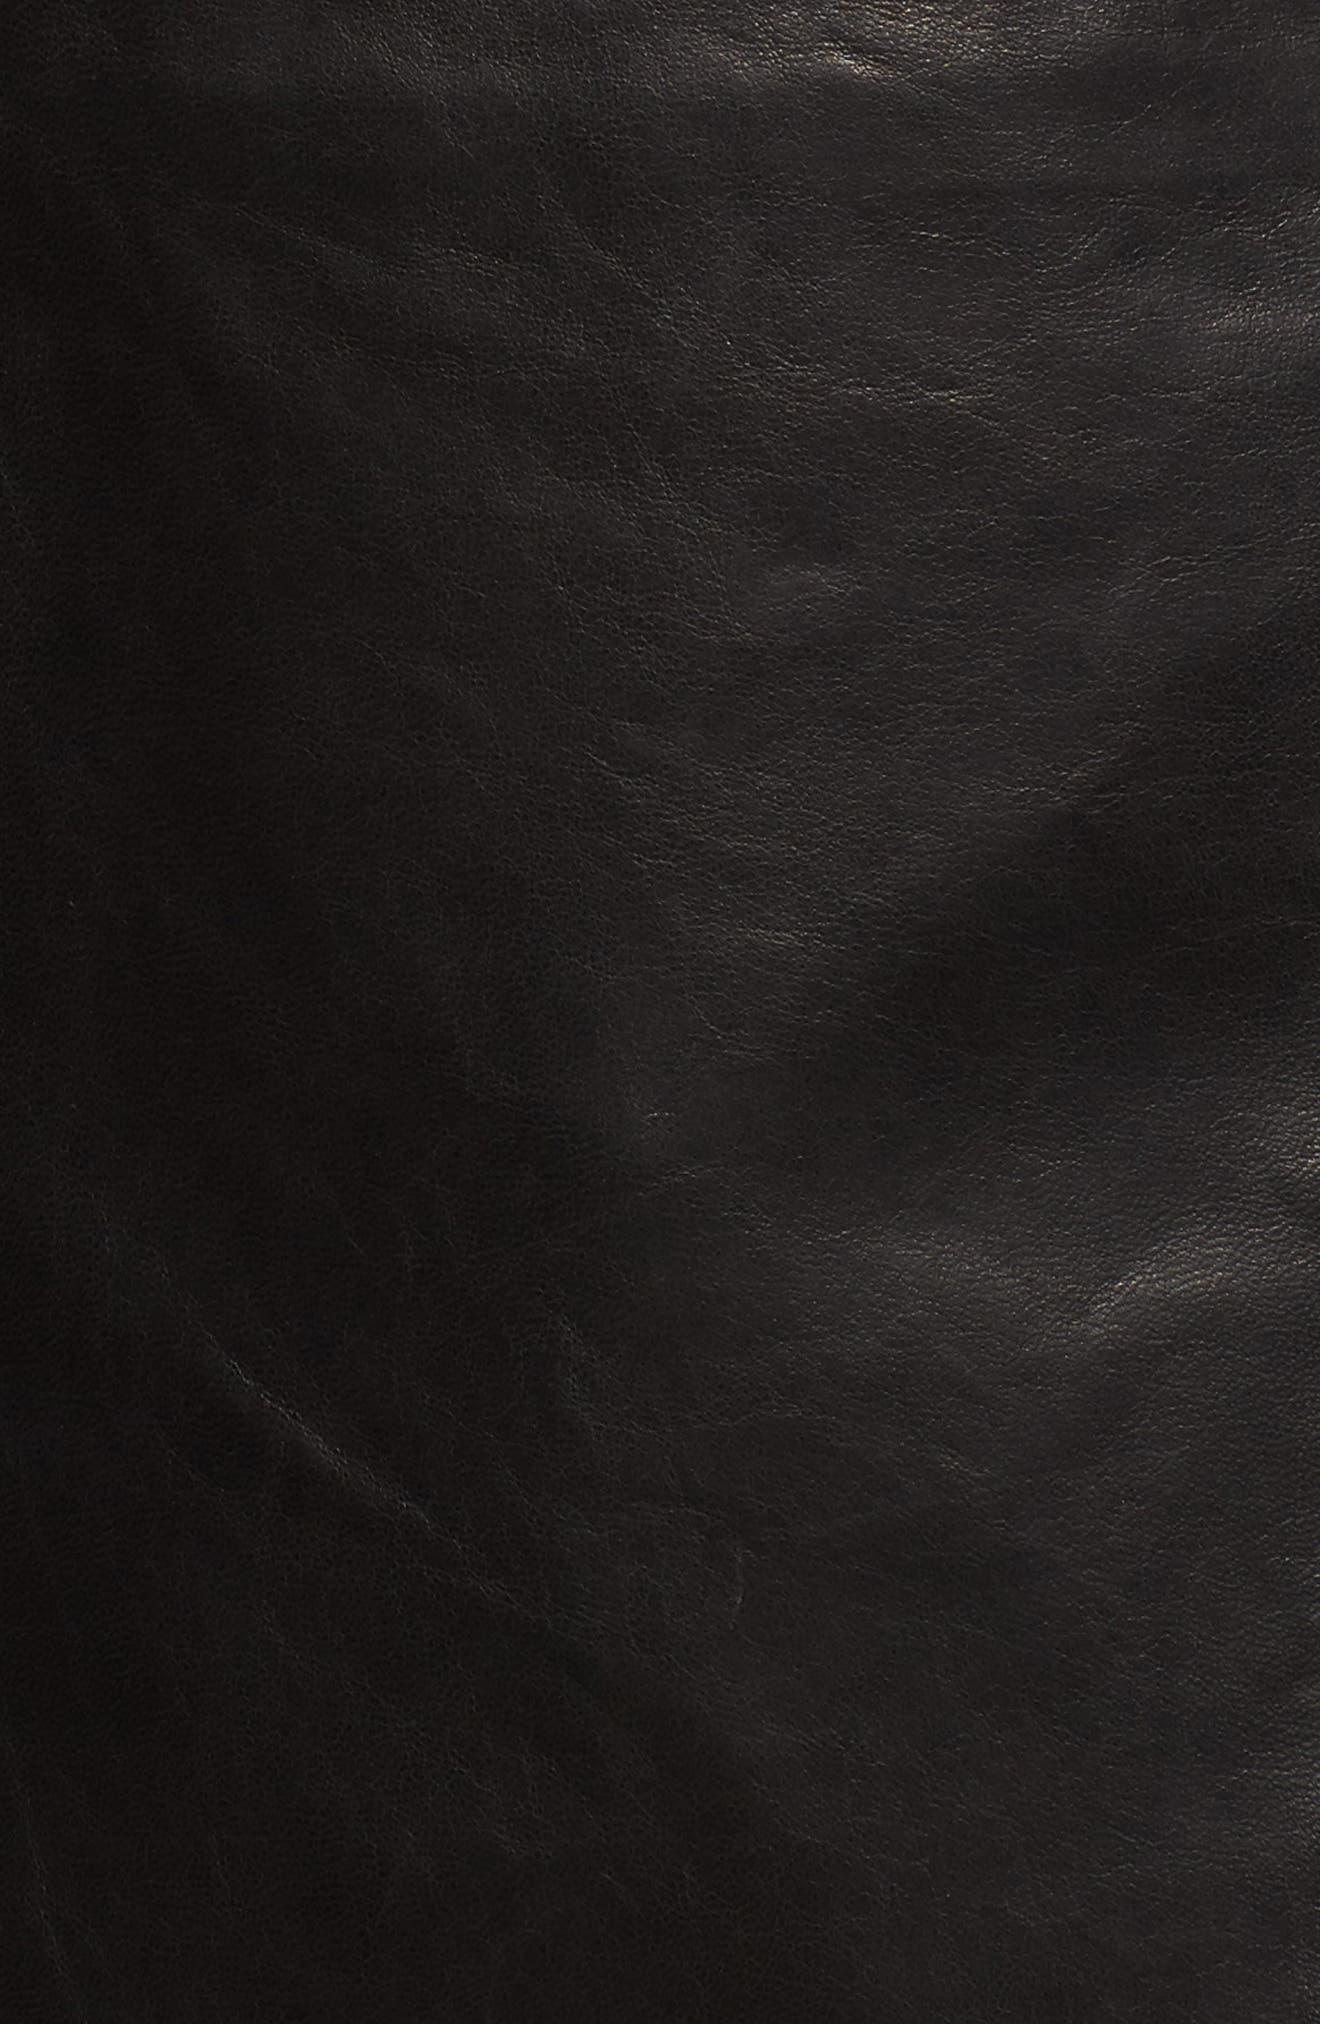 Presley Moto Leather Jacket,                             Alternate thumbnail 5, color,                             Black